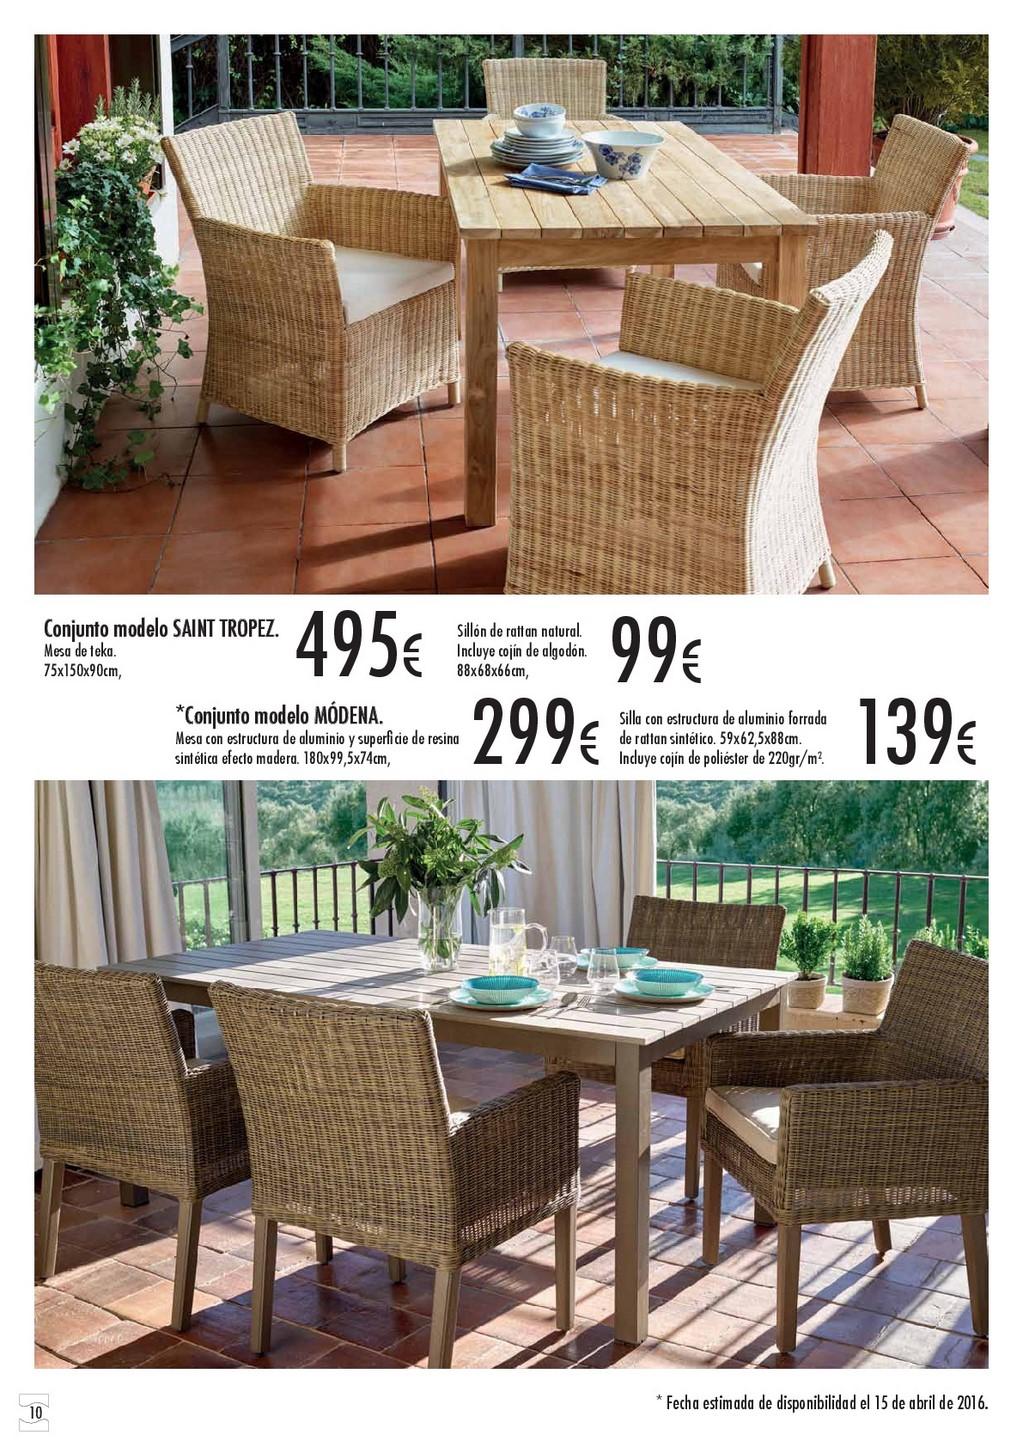 Terraza y jardin hipercor 201610 for Catalogo hipercor muebles jardin